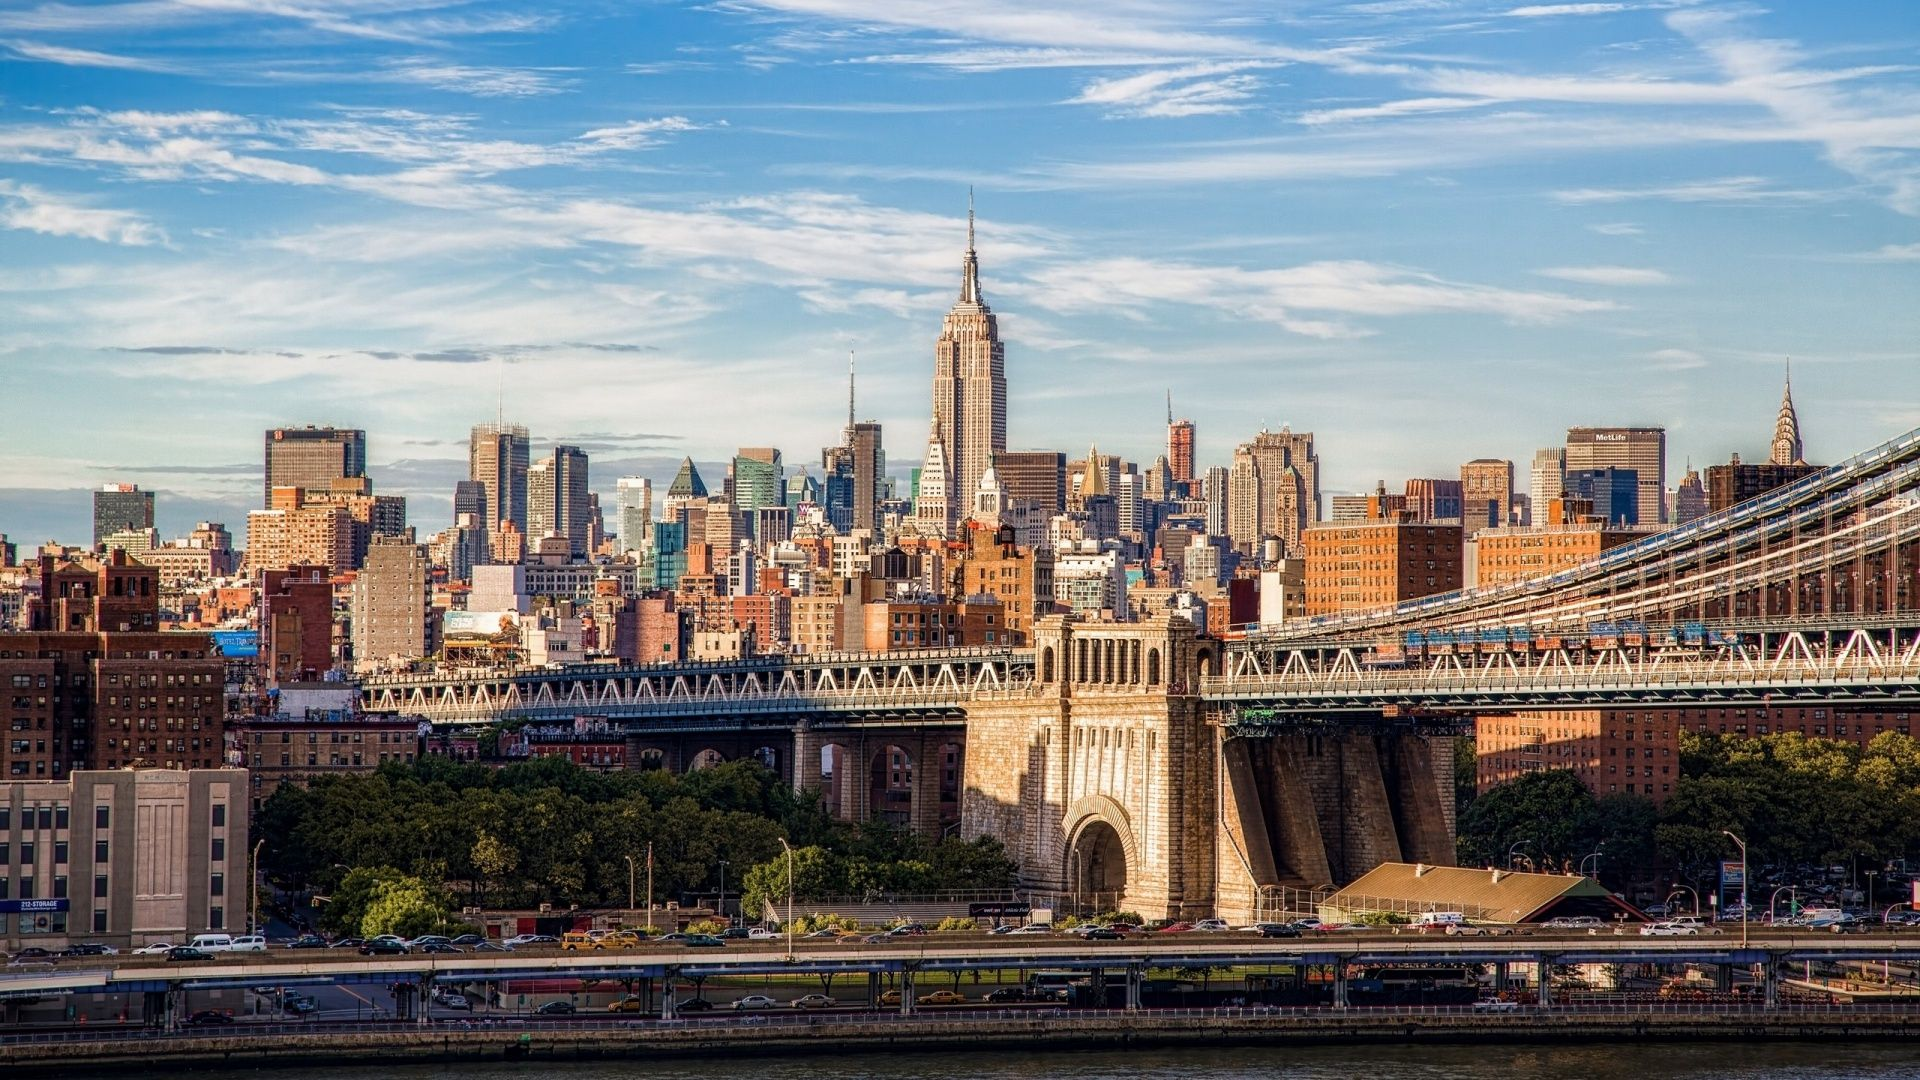 Brooklyn Bridge Wallpapers Top Free Brooklyn Bridge Backgrounds Wallpaperaccess